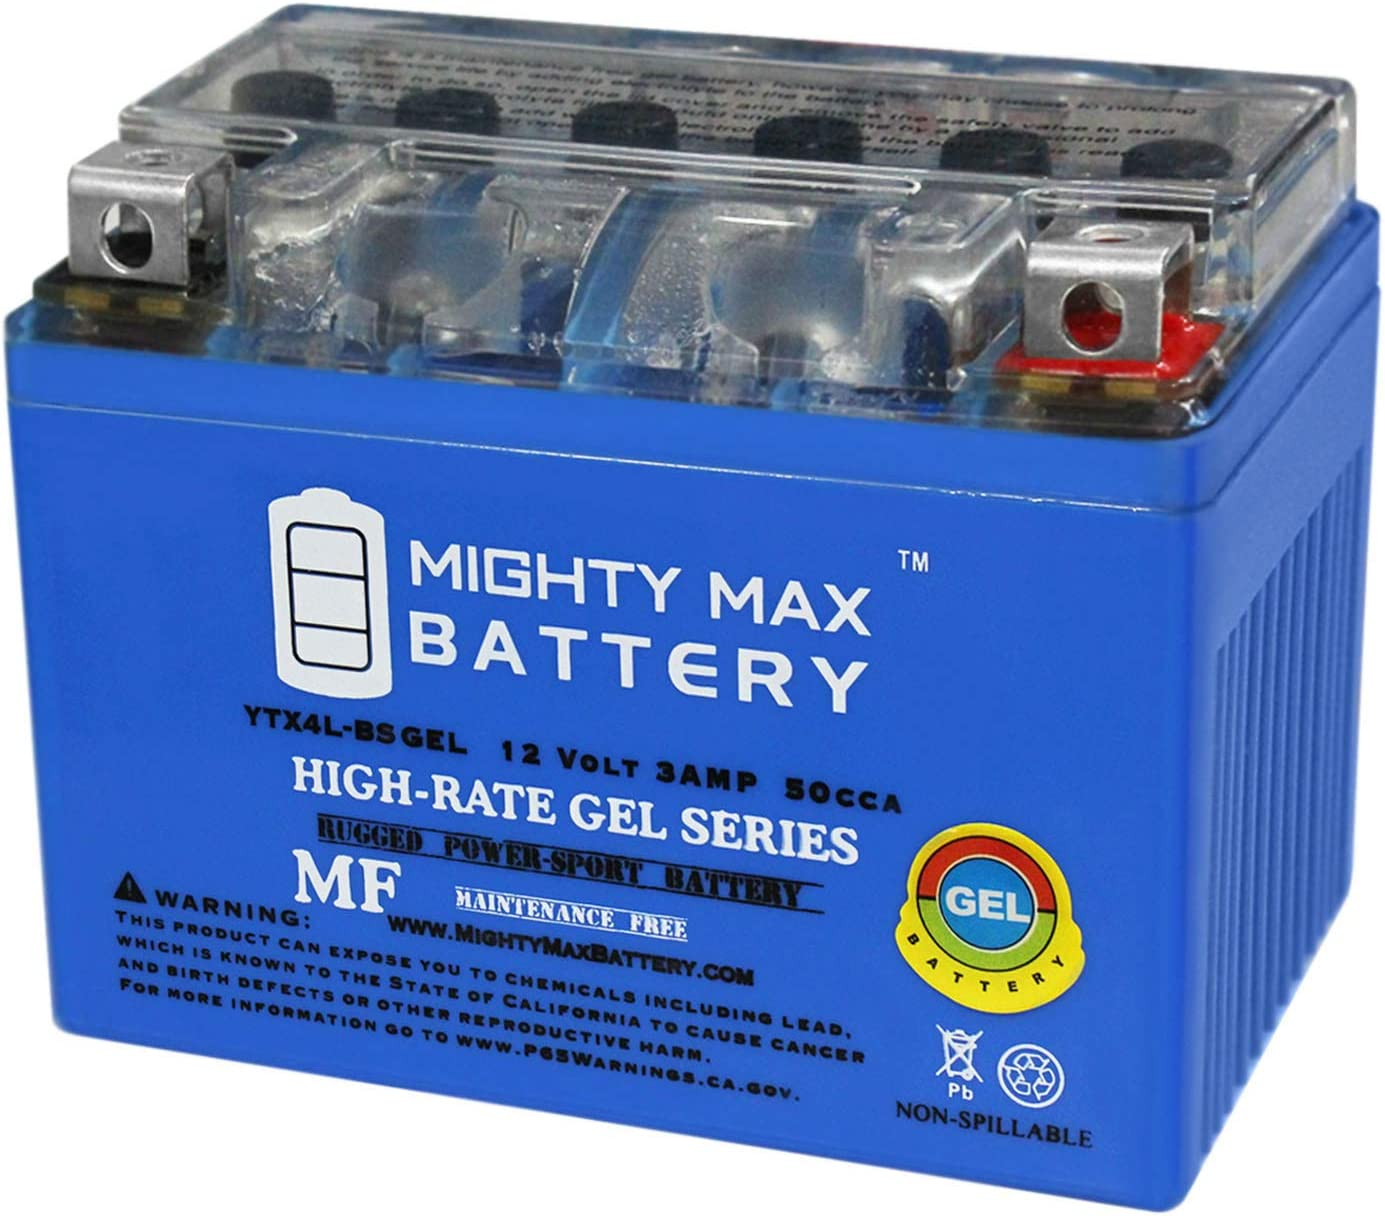 ytx4l-bs 12 V 3 Ah Gelバッテリーforホンダtg50ジャイロSスクーター – Mighty Maxバッテリーブランド製品